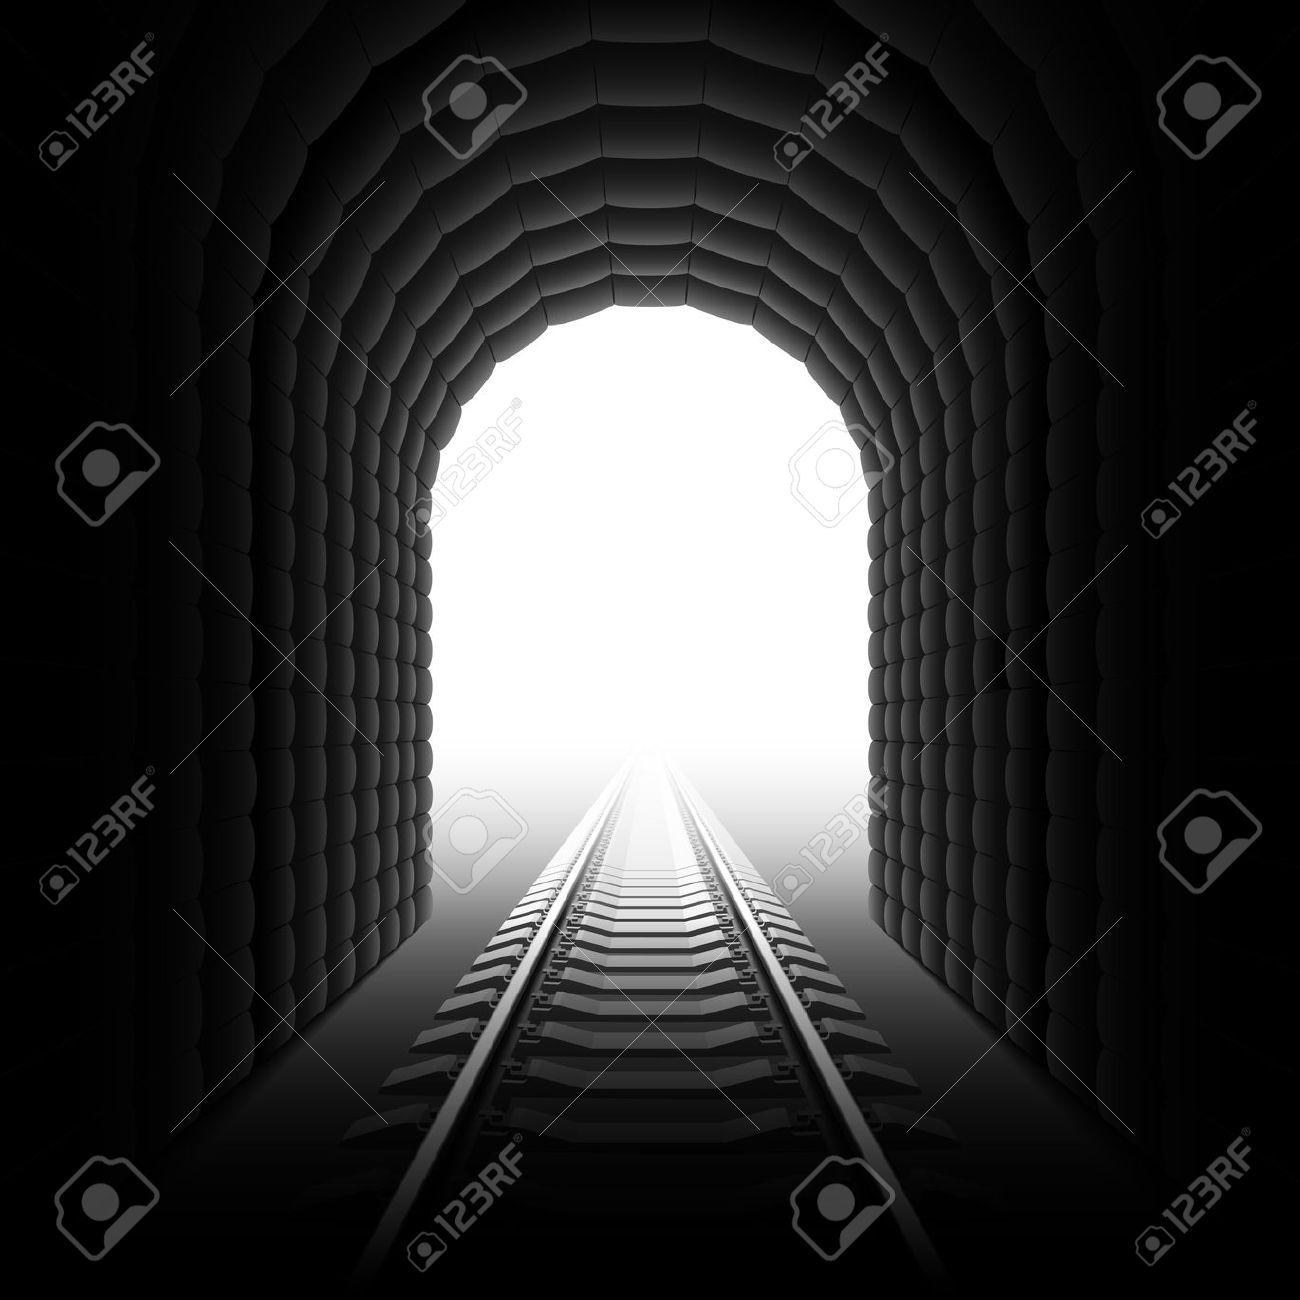 Train tunnel entrance clipart.